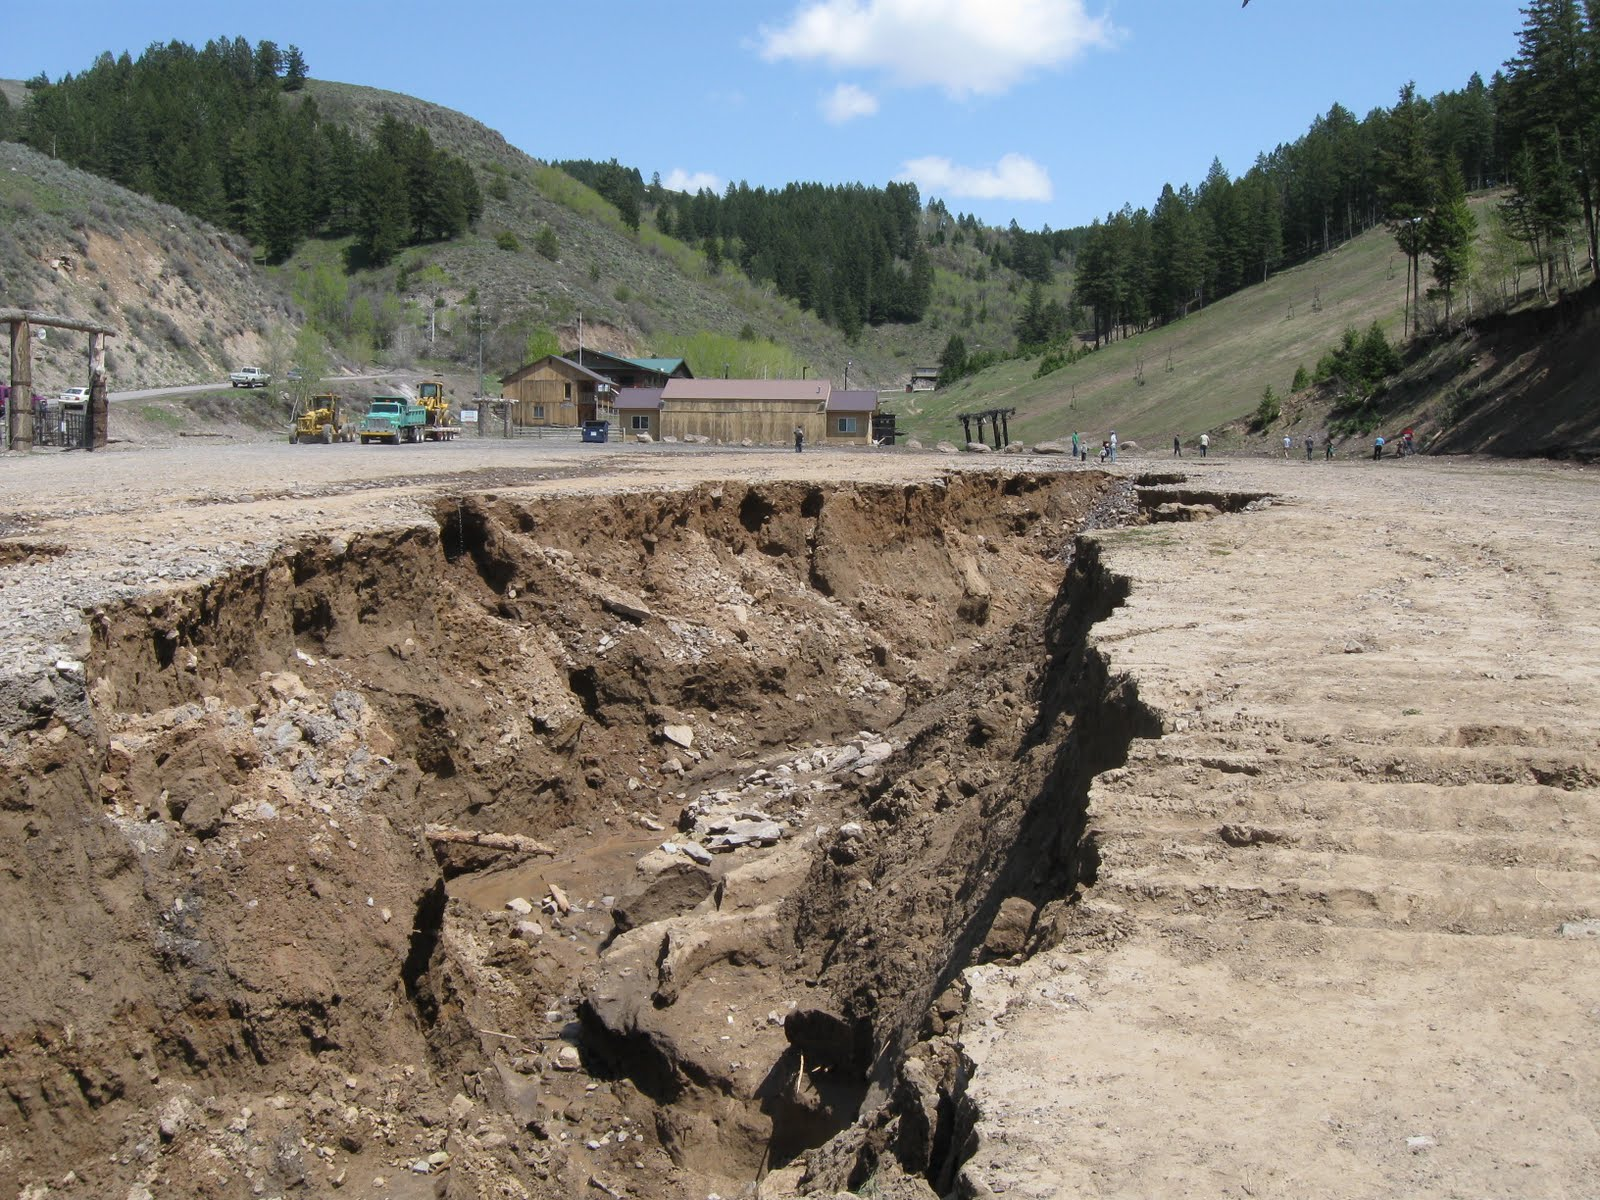 Glacial Erosion Features - seodiving.com